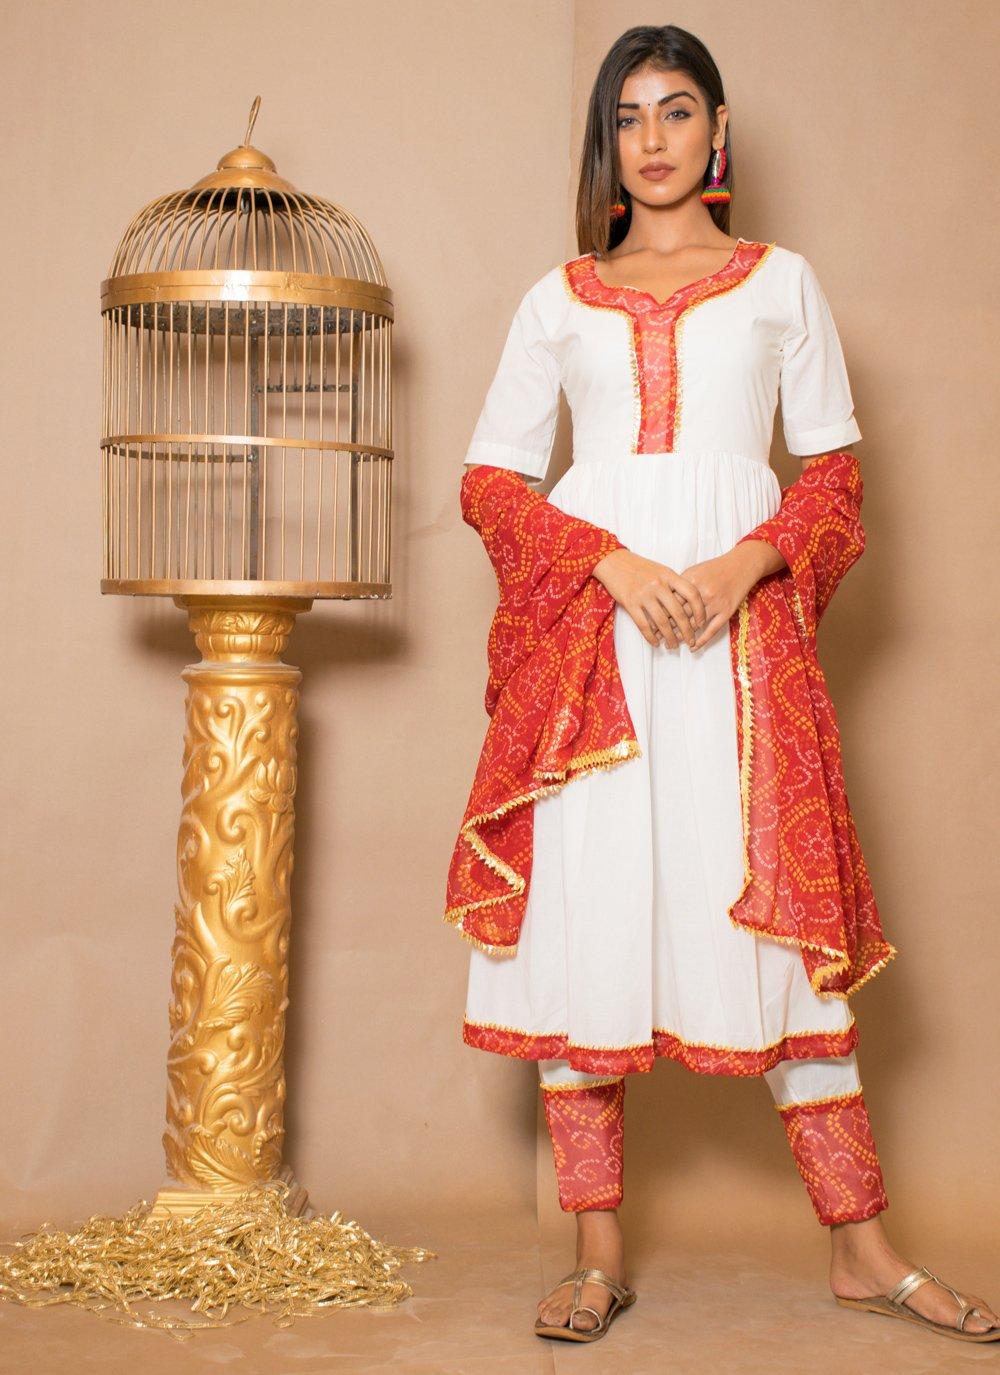 Off White Cotton Lace Readymade Salwar Kameez